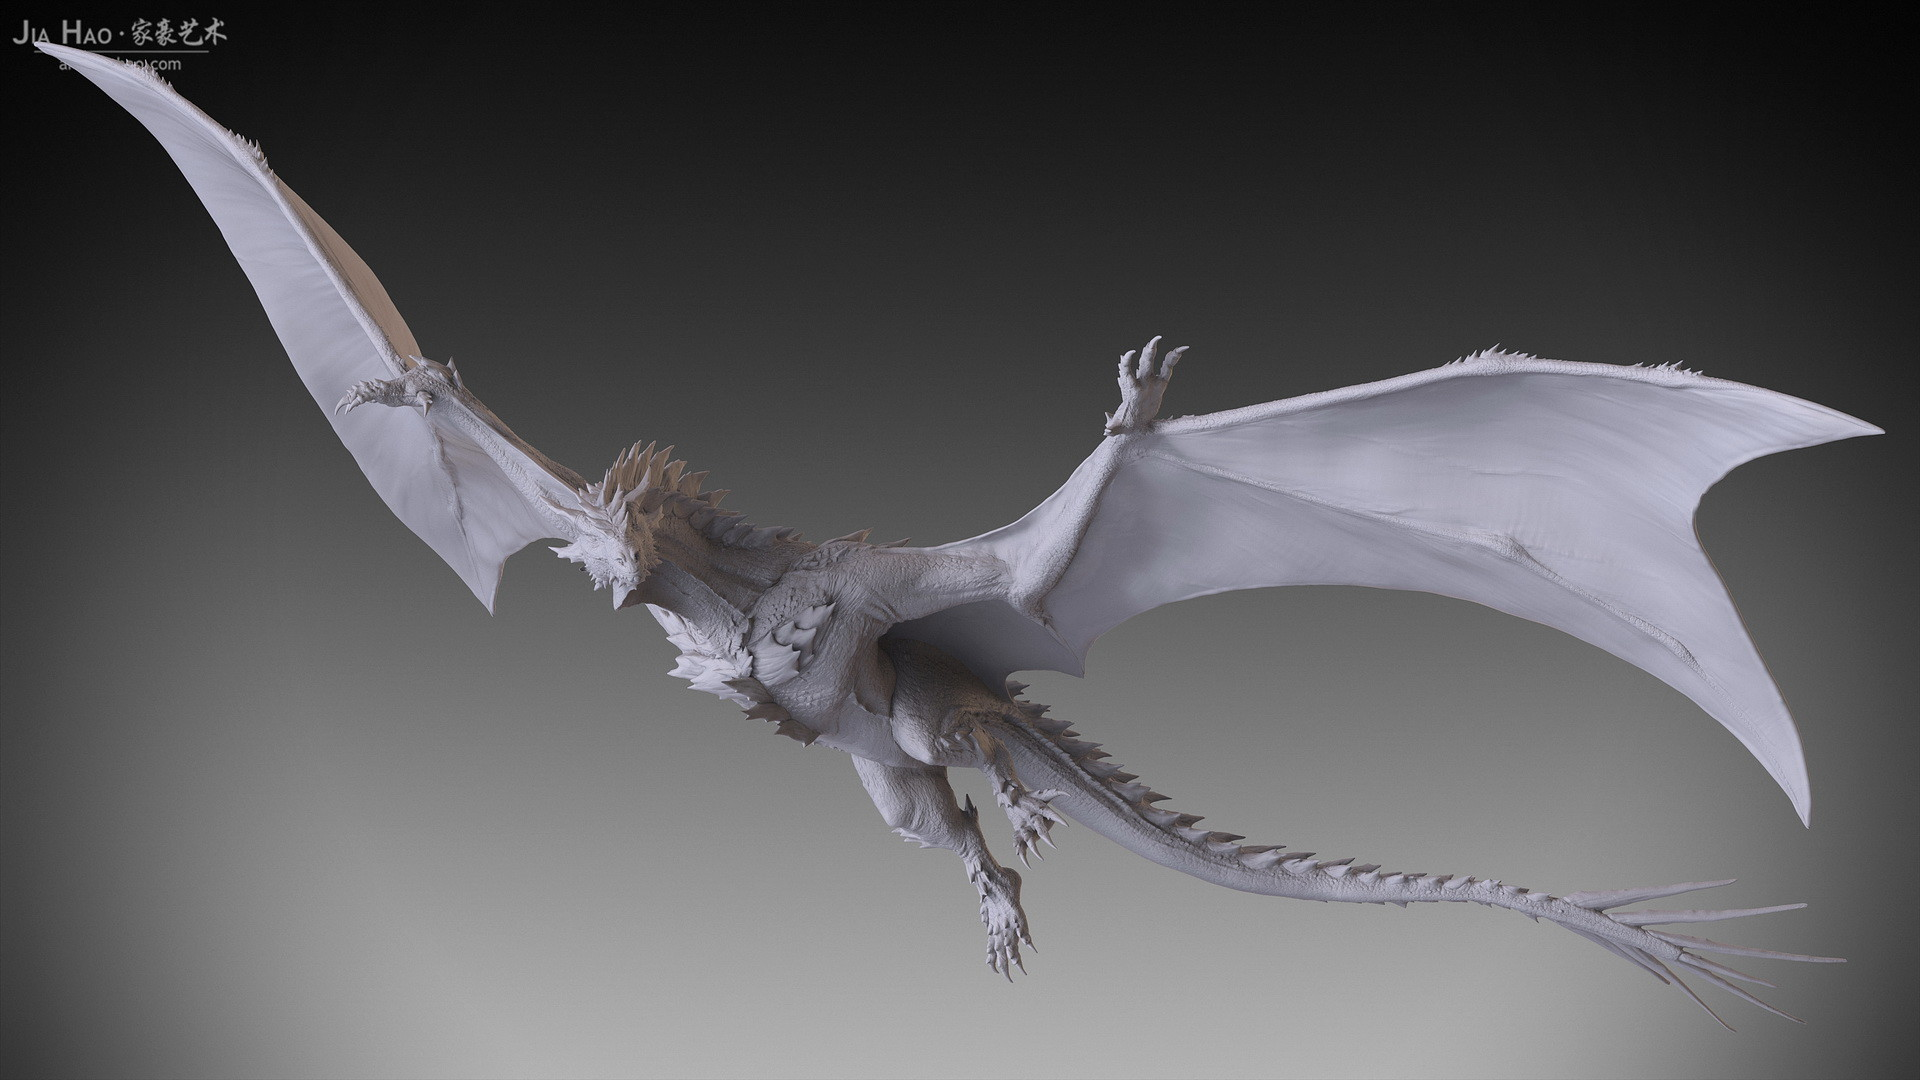 Jia hao 2017 spikydragon flying digitalsculpting 02